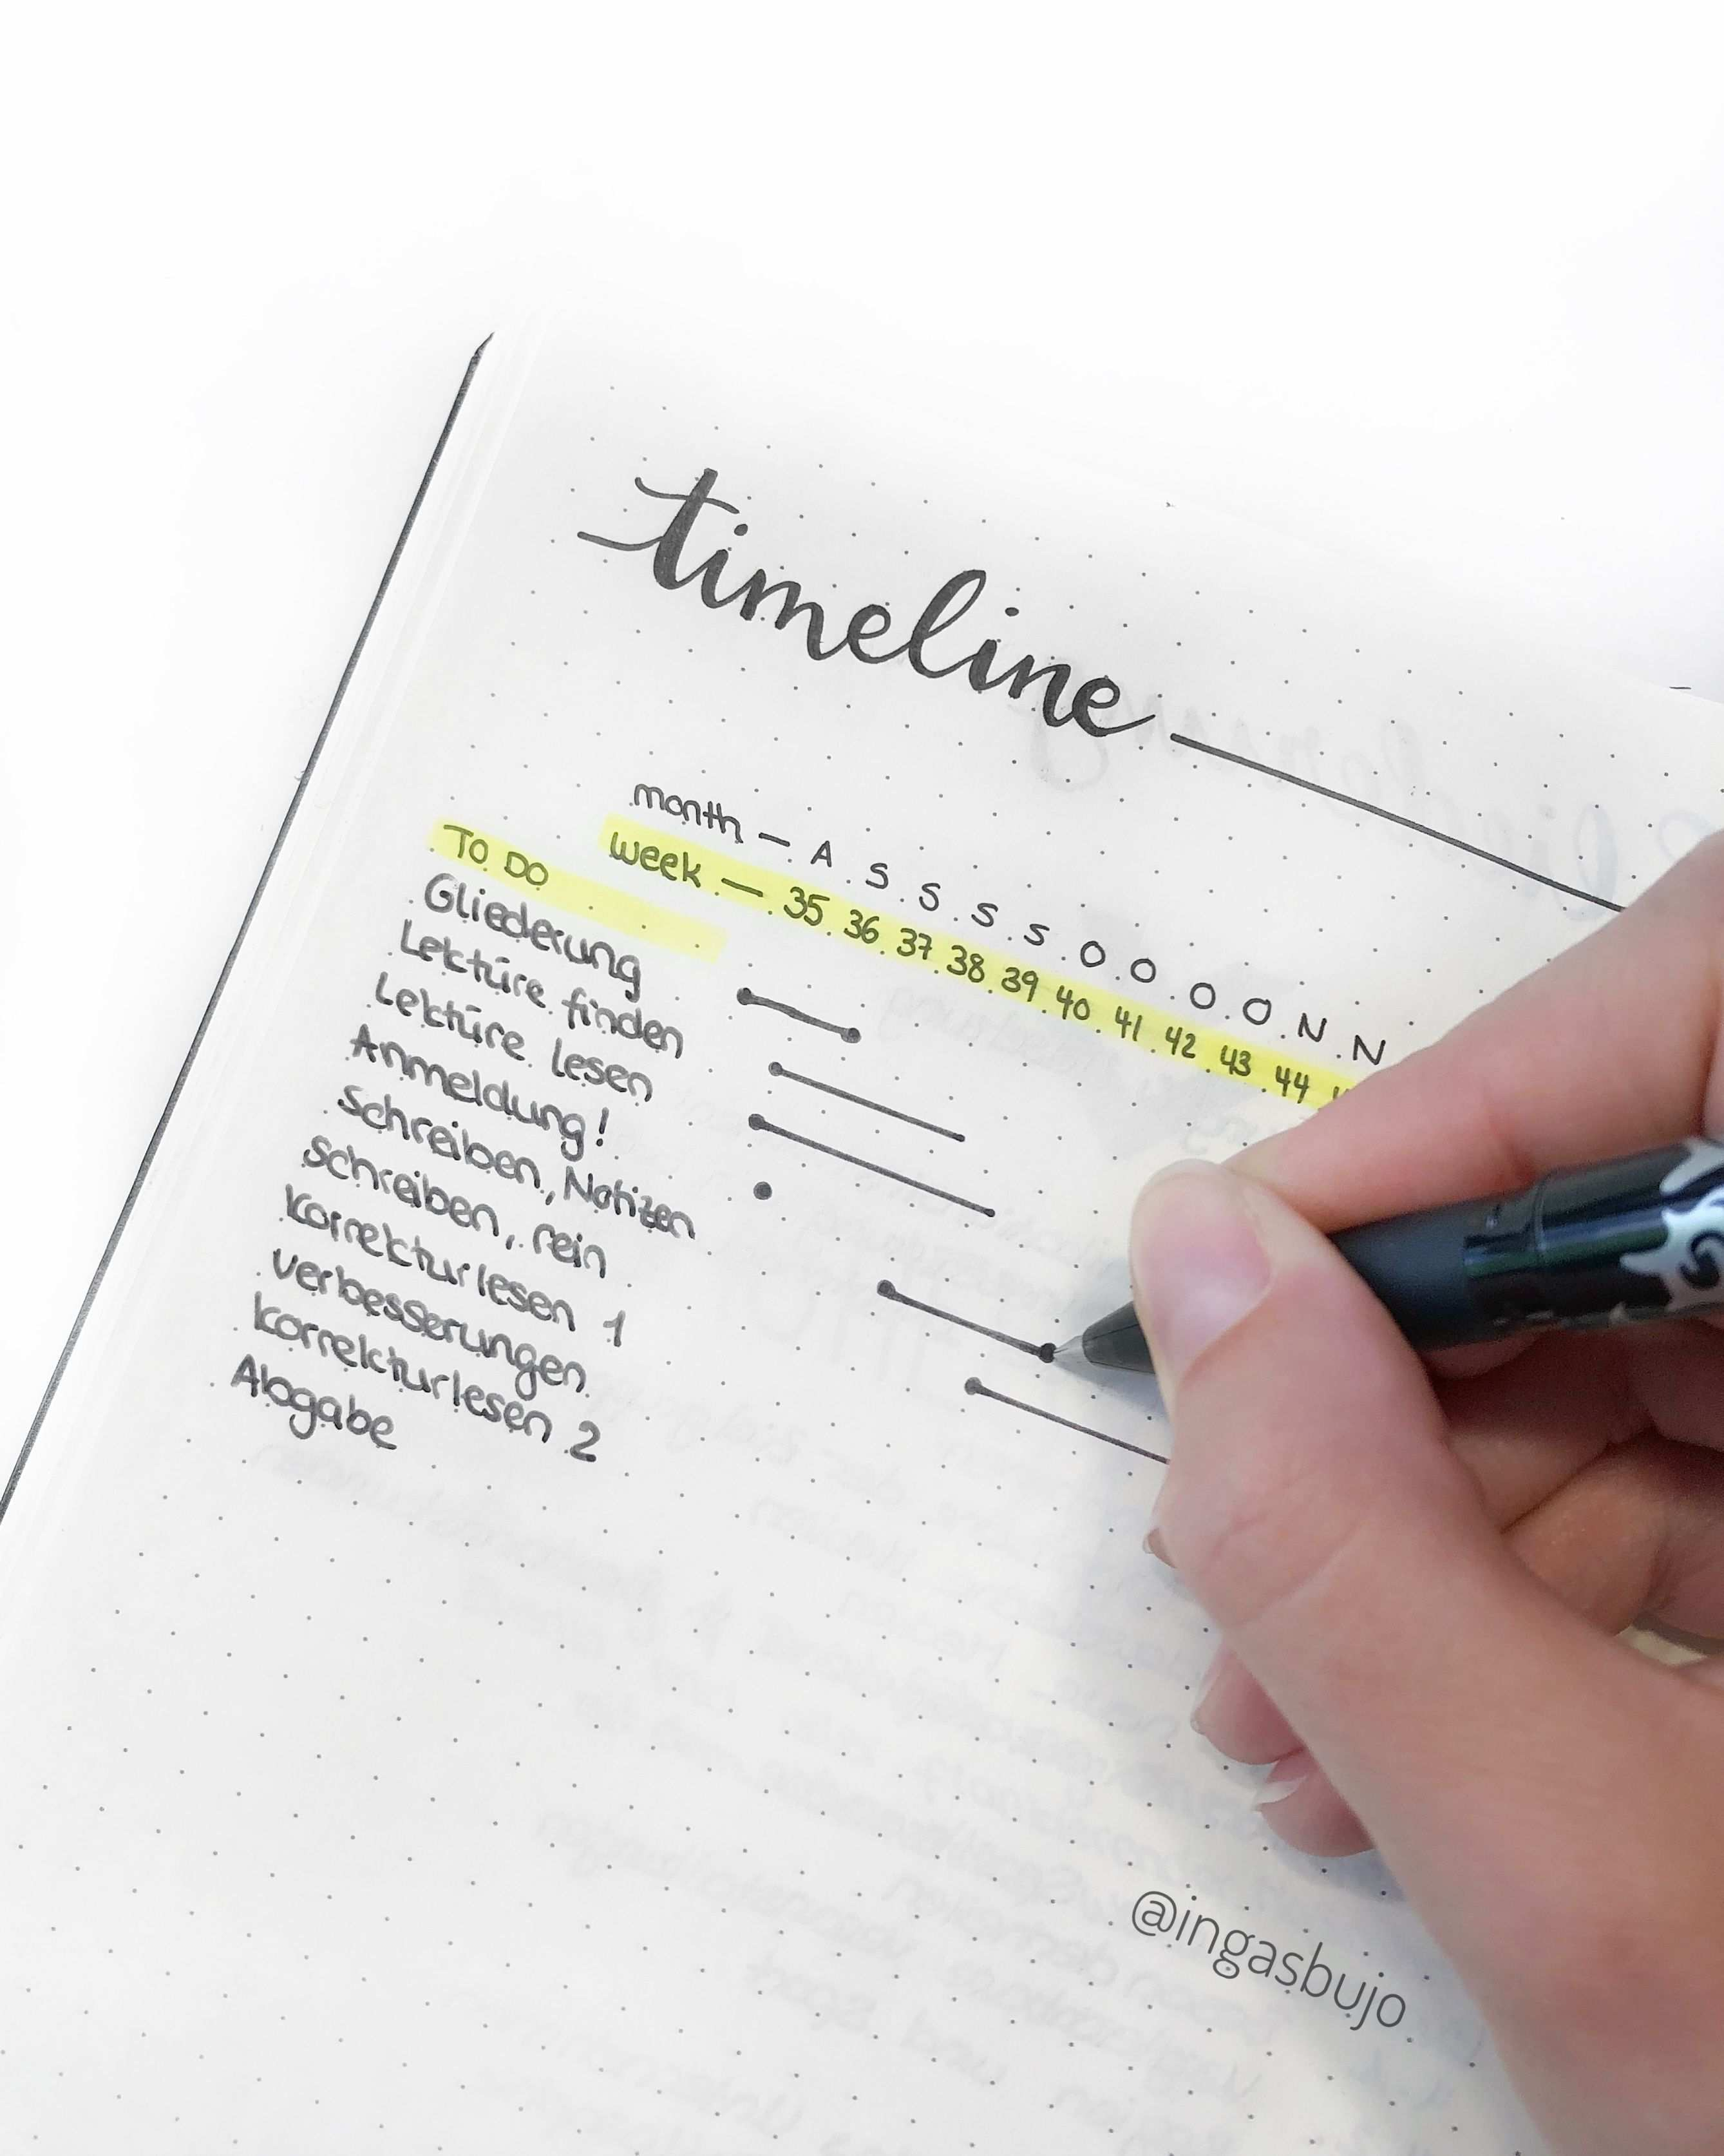 Bachelor Thesis Im Bujo Ingas Blog Studieren Tipps Bullet Journal Bachelorarbeit